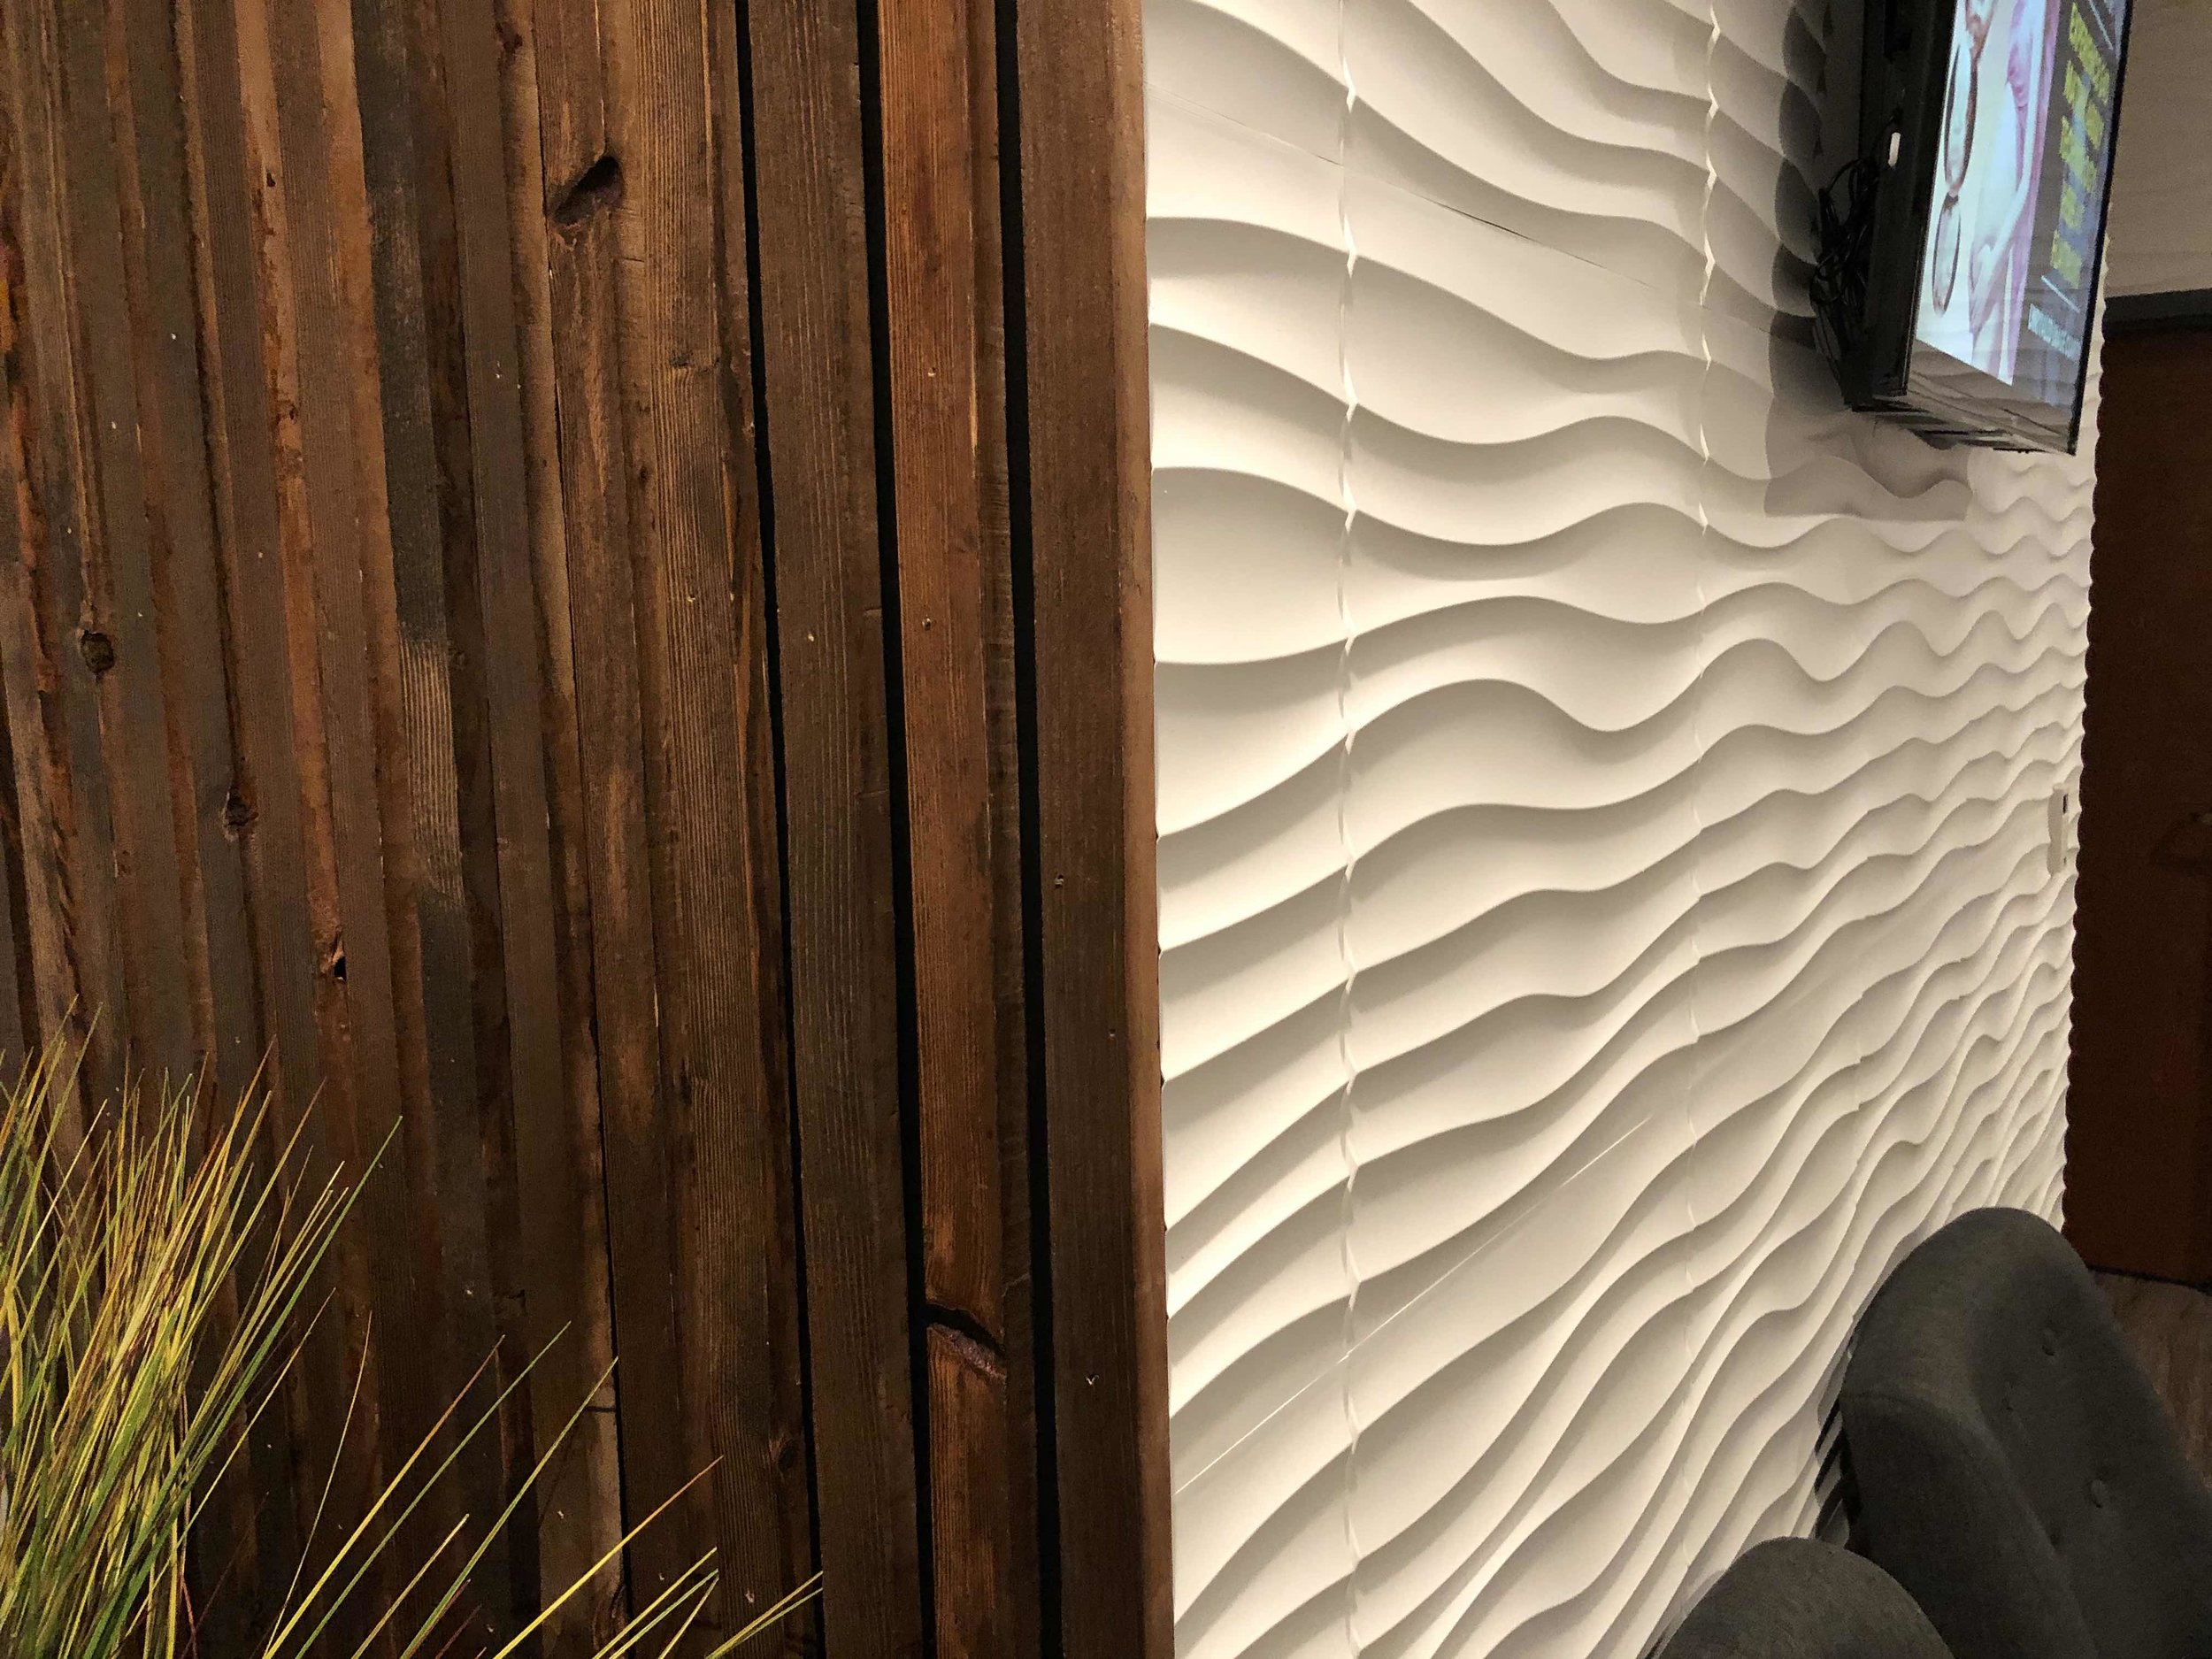 3d wall panel.jpg